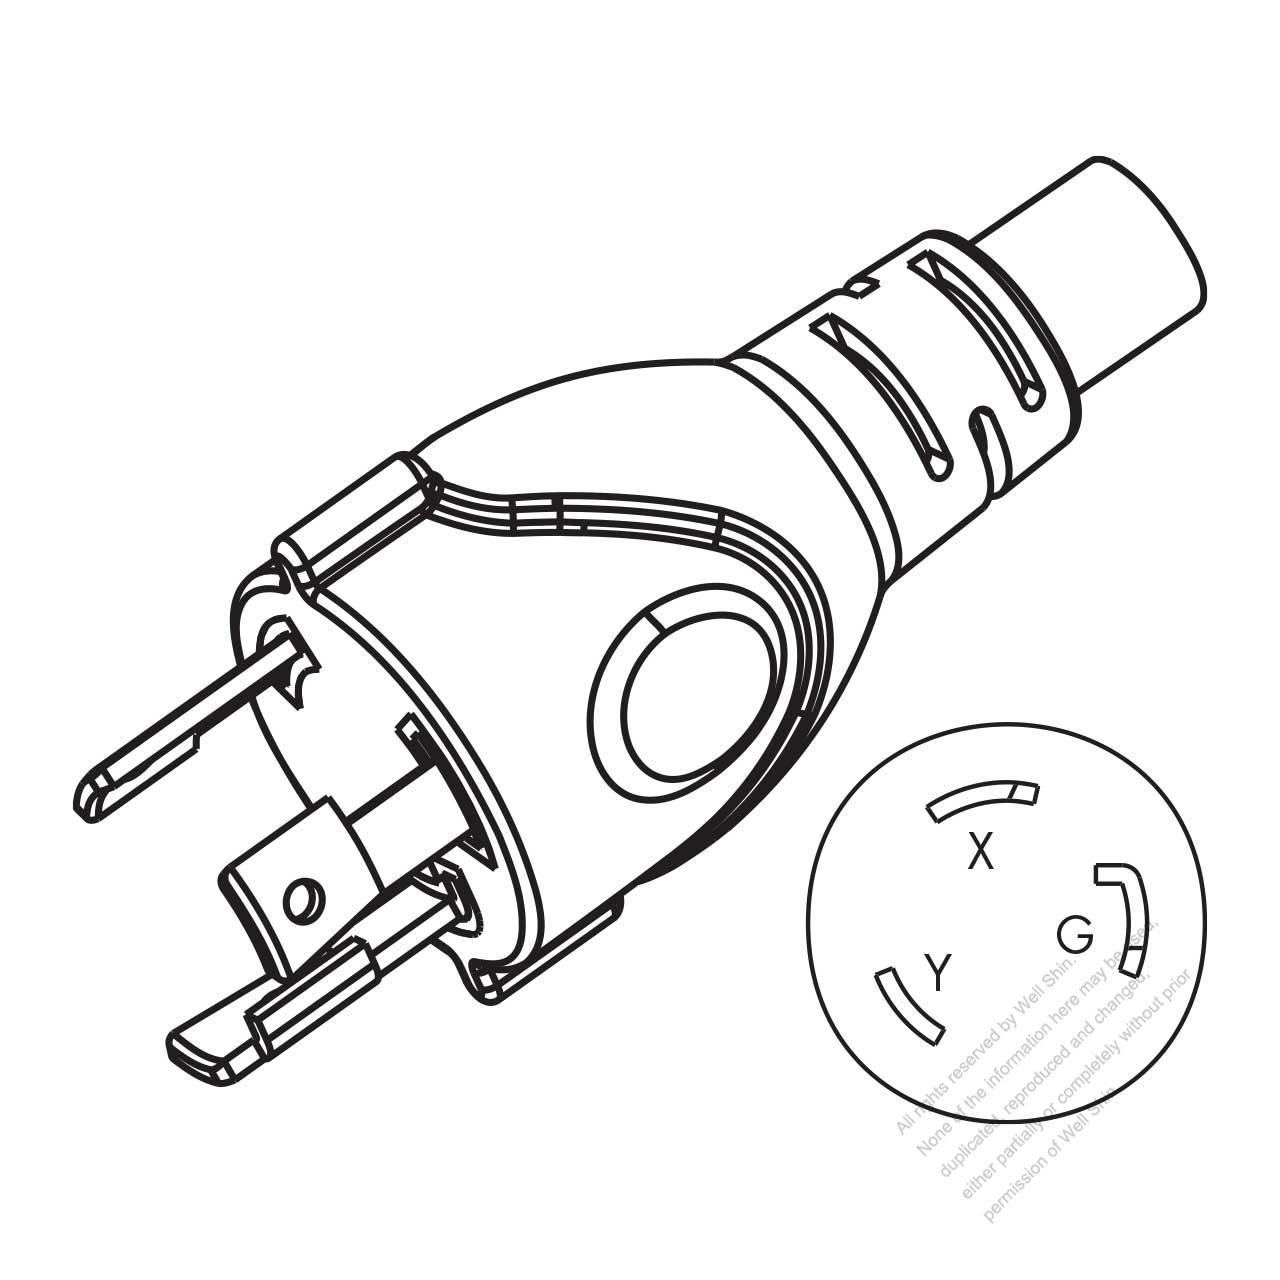 usa canada nema l6 30p twist locking ac plug 2 p 3 wire grounding NEMA L5- 30P usa canada nema l6 30p twist locking ac plug 2 p 3